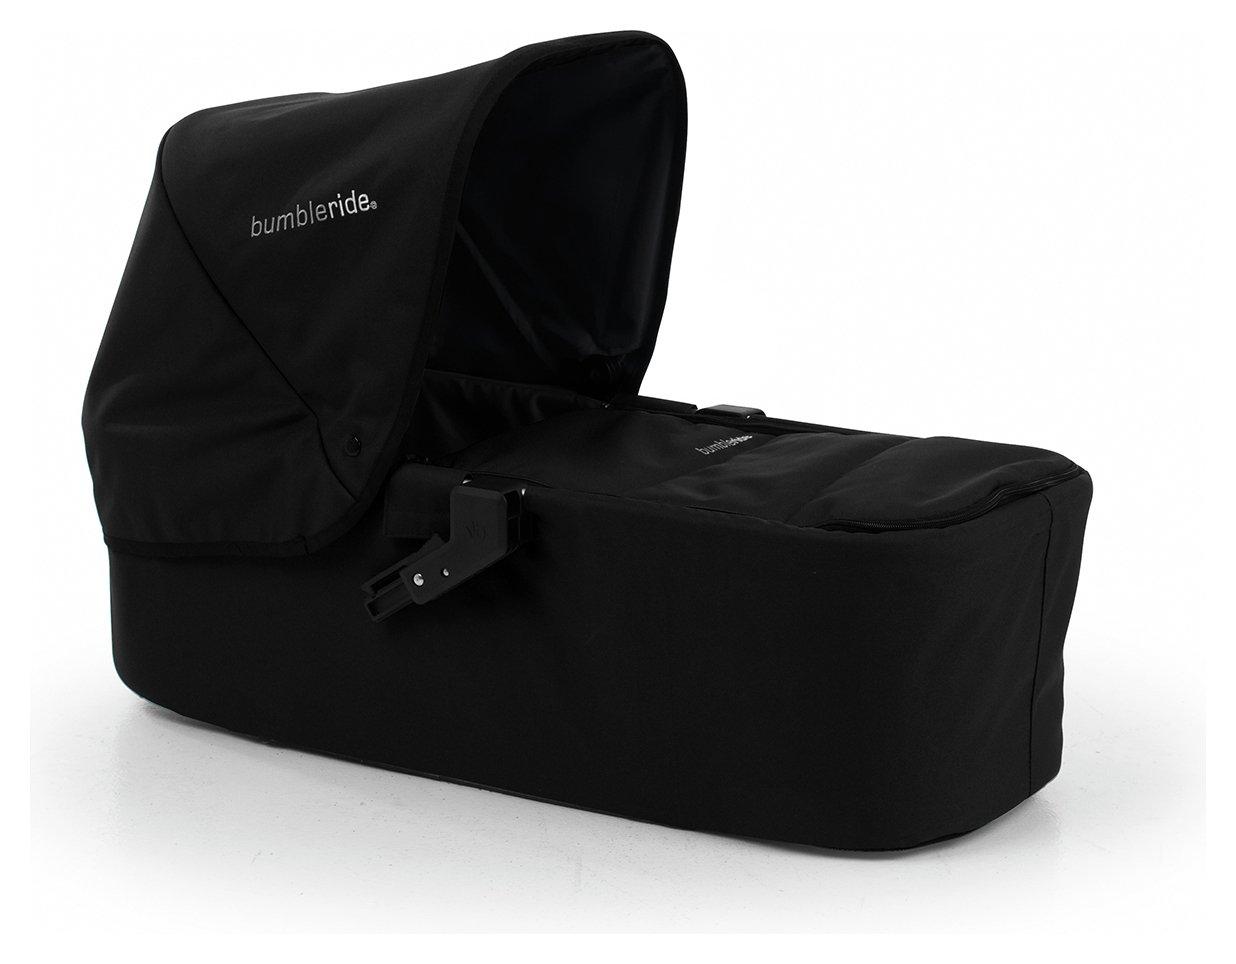 Image of Bumbleride Indie Carrycot - Jet Black.